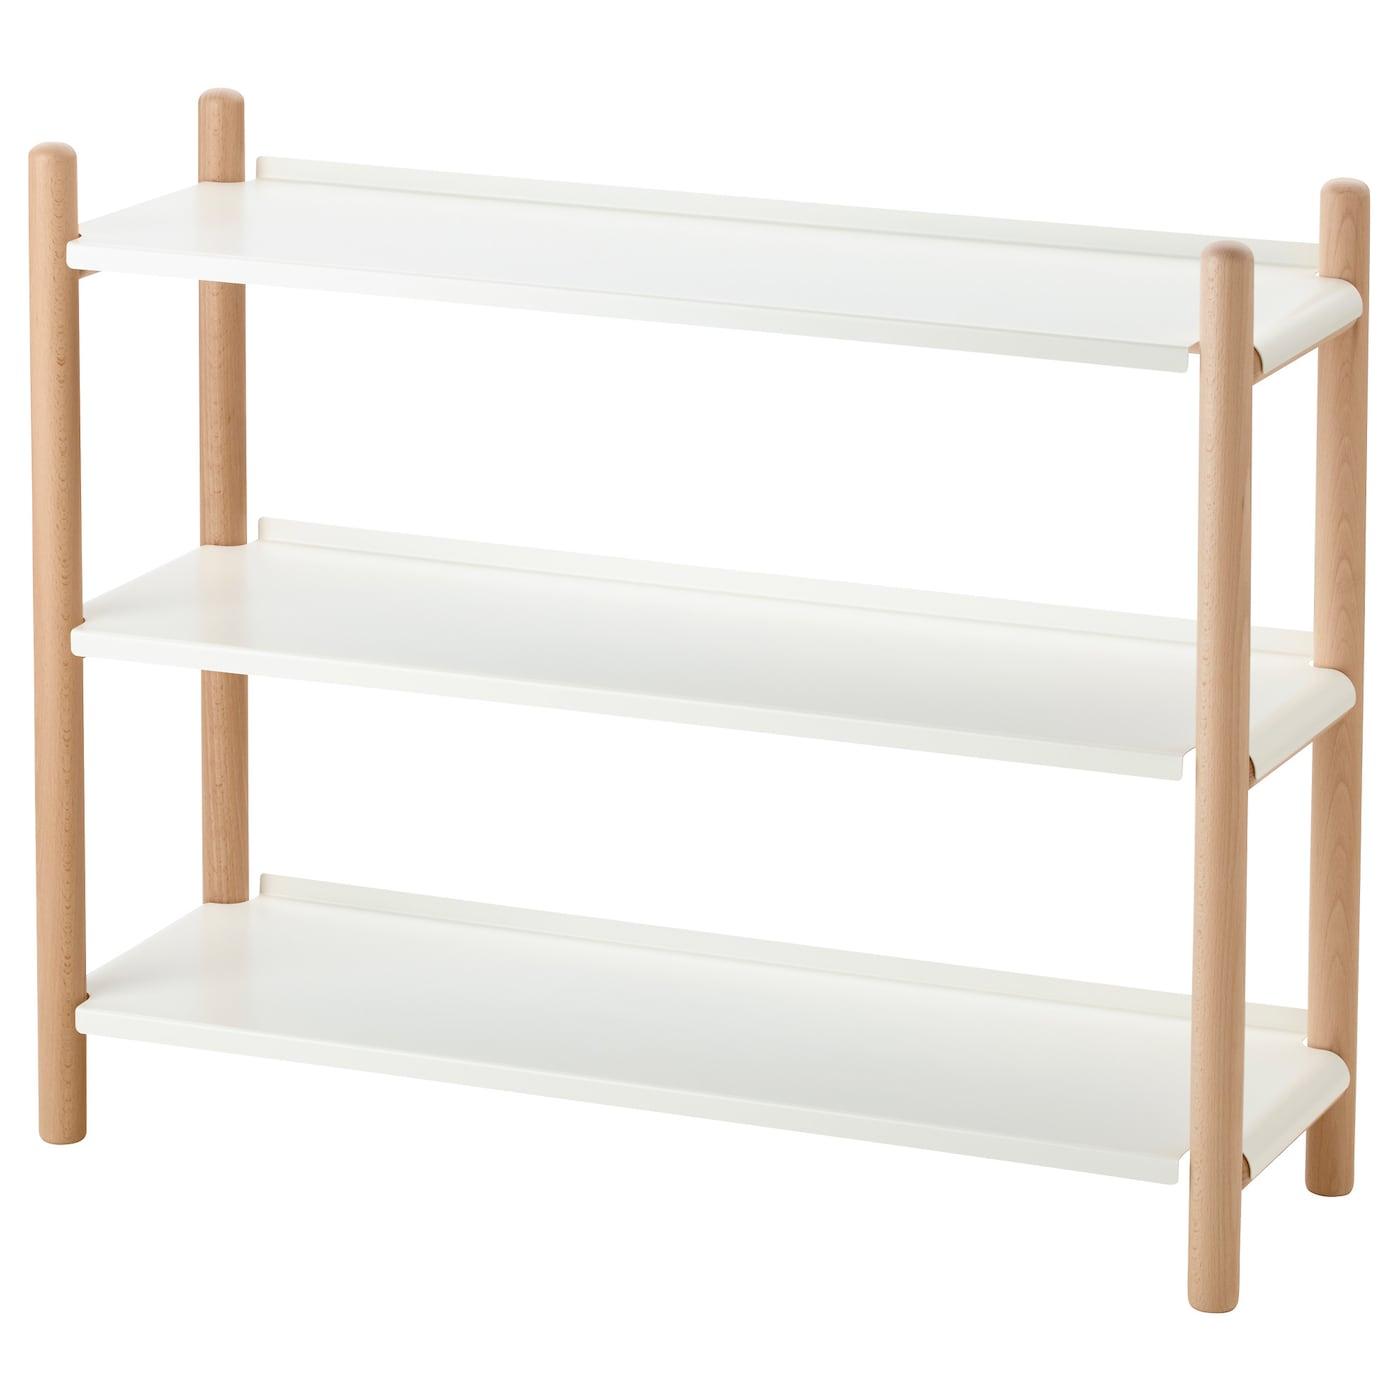 bibliothque escalier ikea latest enchanteur bibliothque escalier ikea et les meilleures idaes. Black Bedroom Furniture Sets. Home Design Ideas